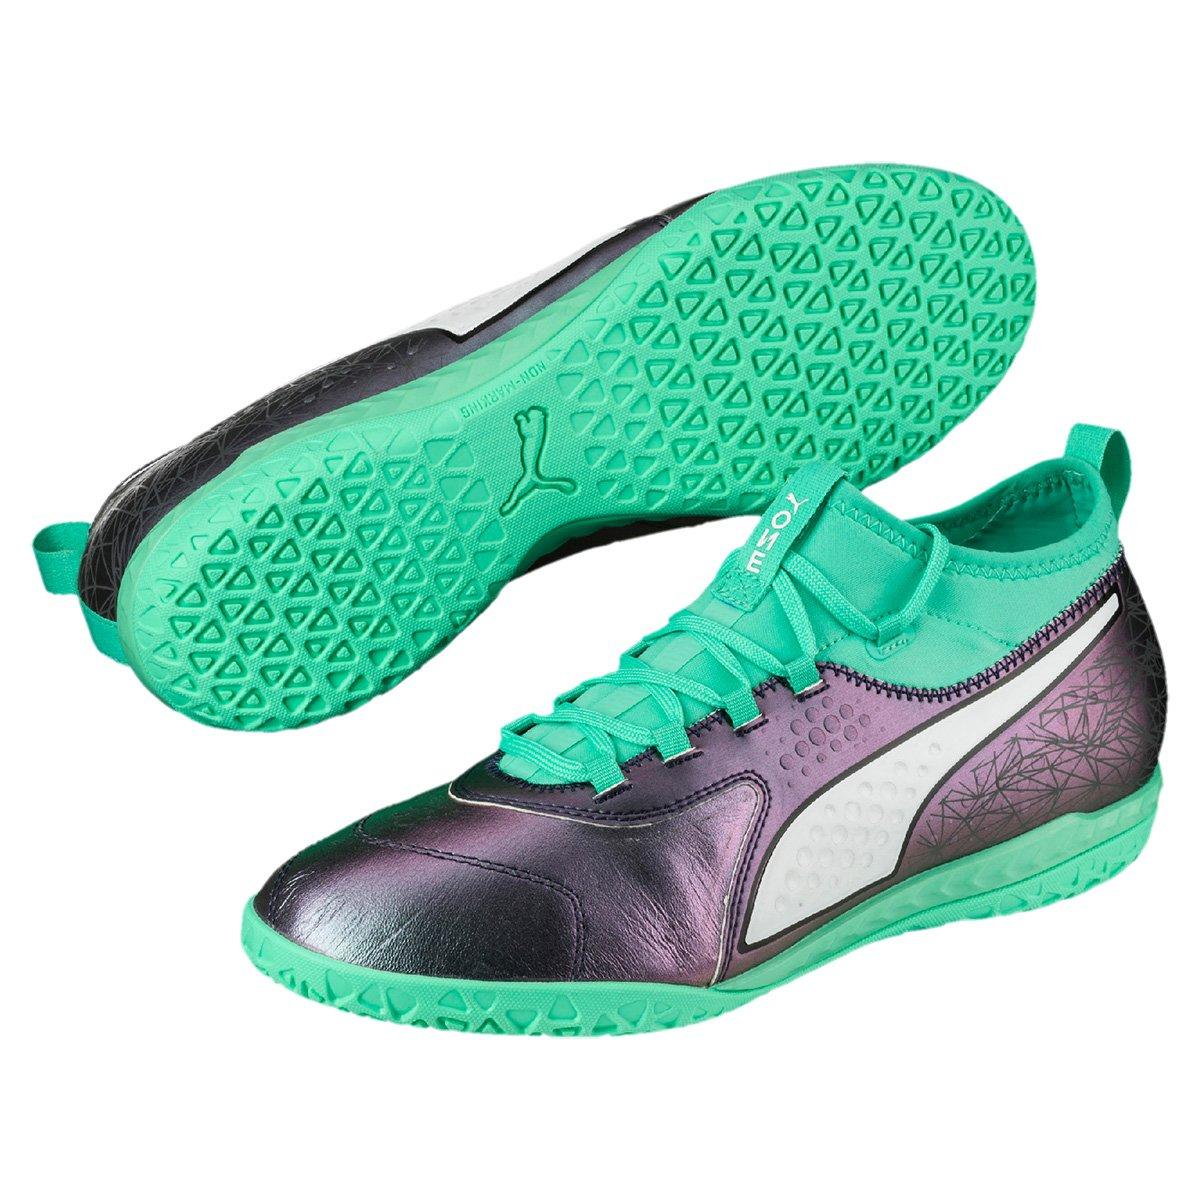 Chuteira Futsal Puma One 3 IL Lth IT BDP - Compre Agora  44279f3c8aa6e